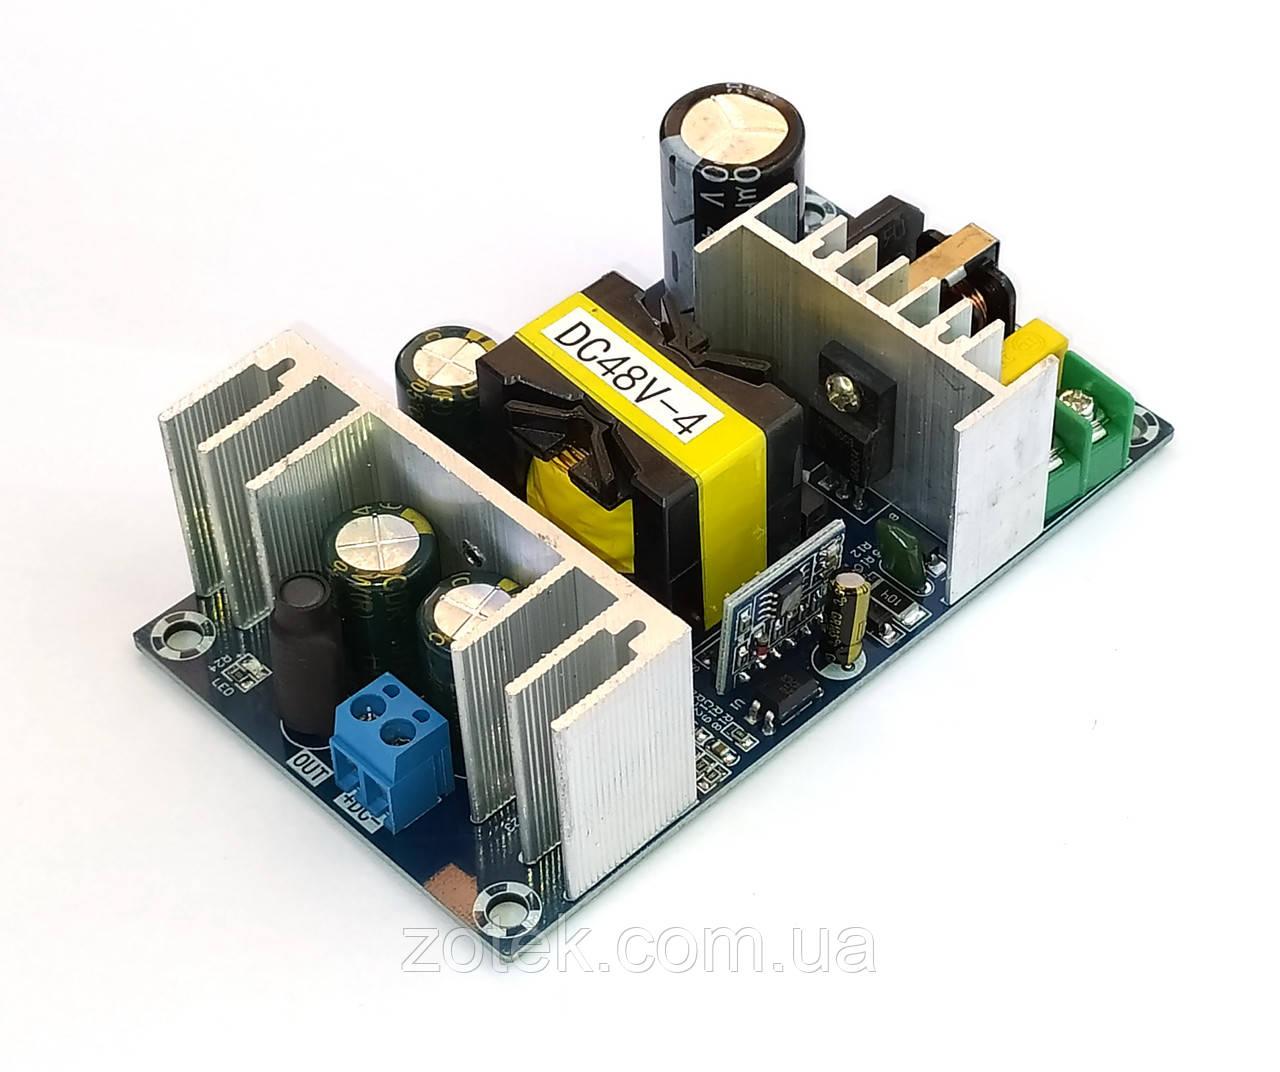 Microchip 48В 4А 5А 200 Вт Импульсный блок питания AC-DC 48V 4A 200W WX-DC4816